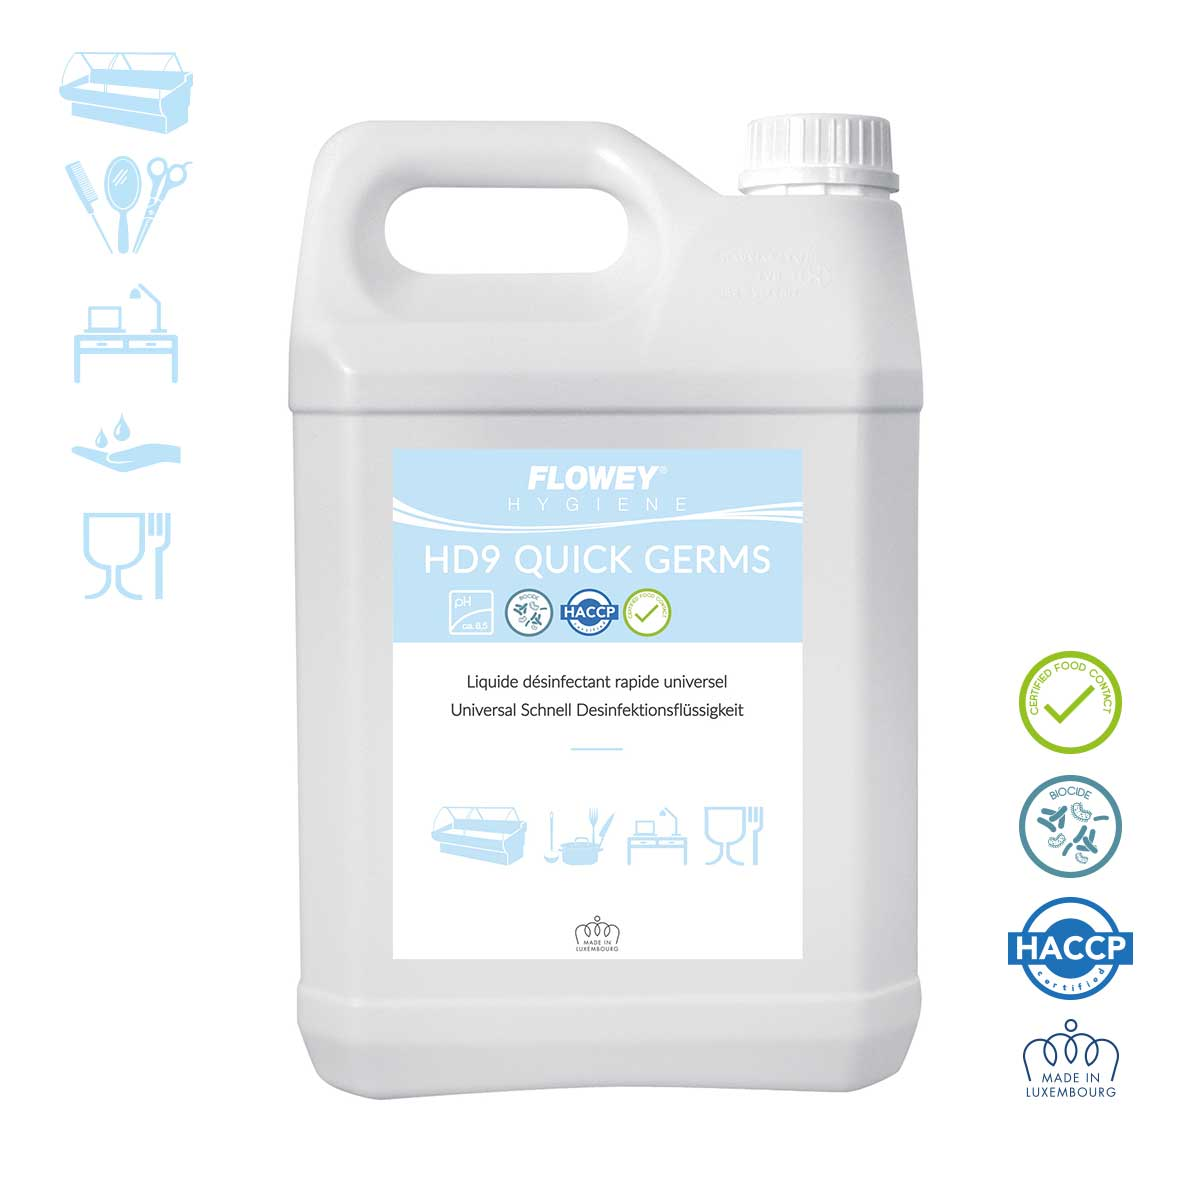 Liquide désinfectant rapide universel - Food Contact - Bidon 5 l